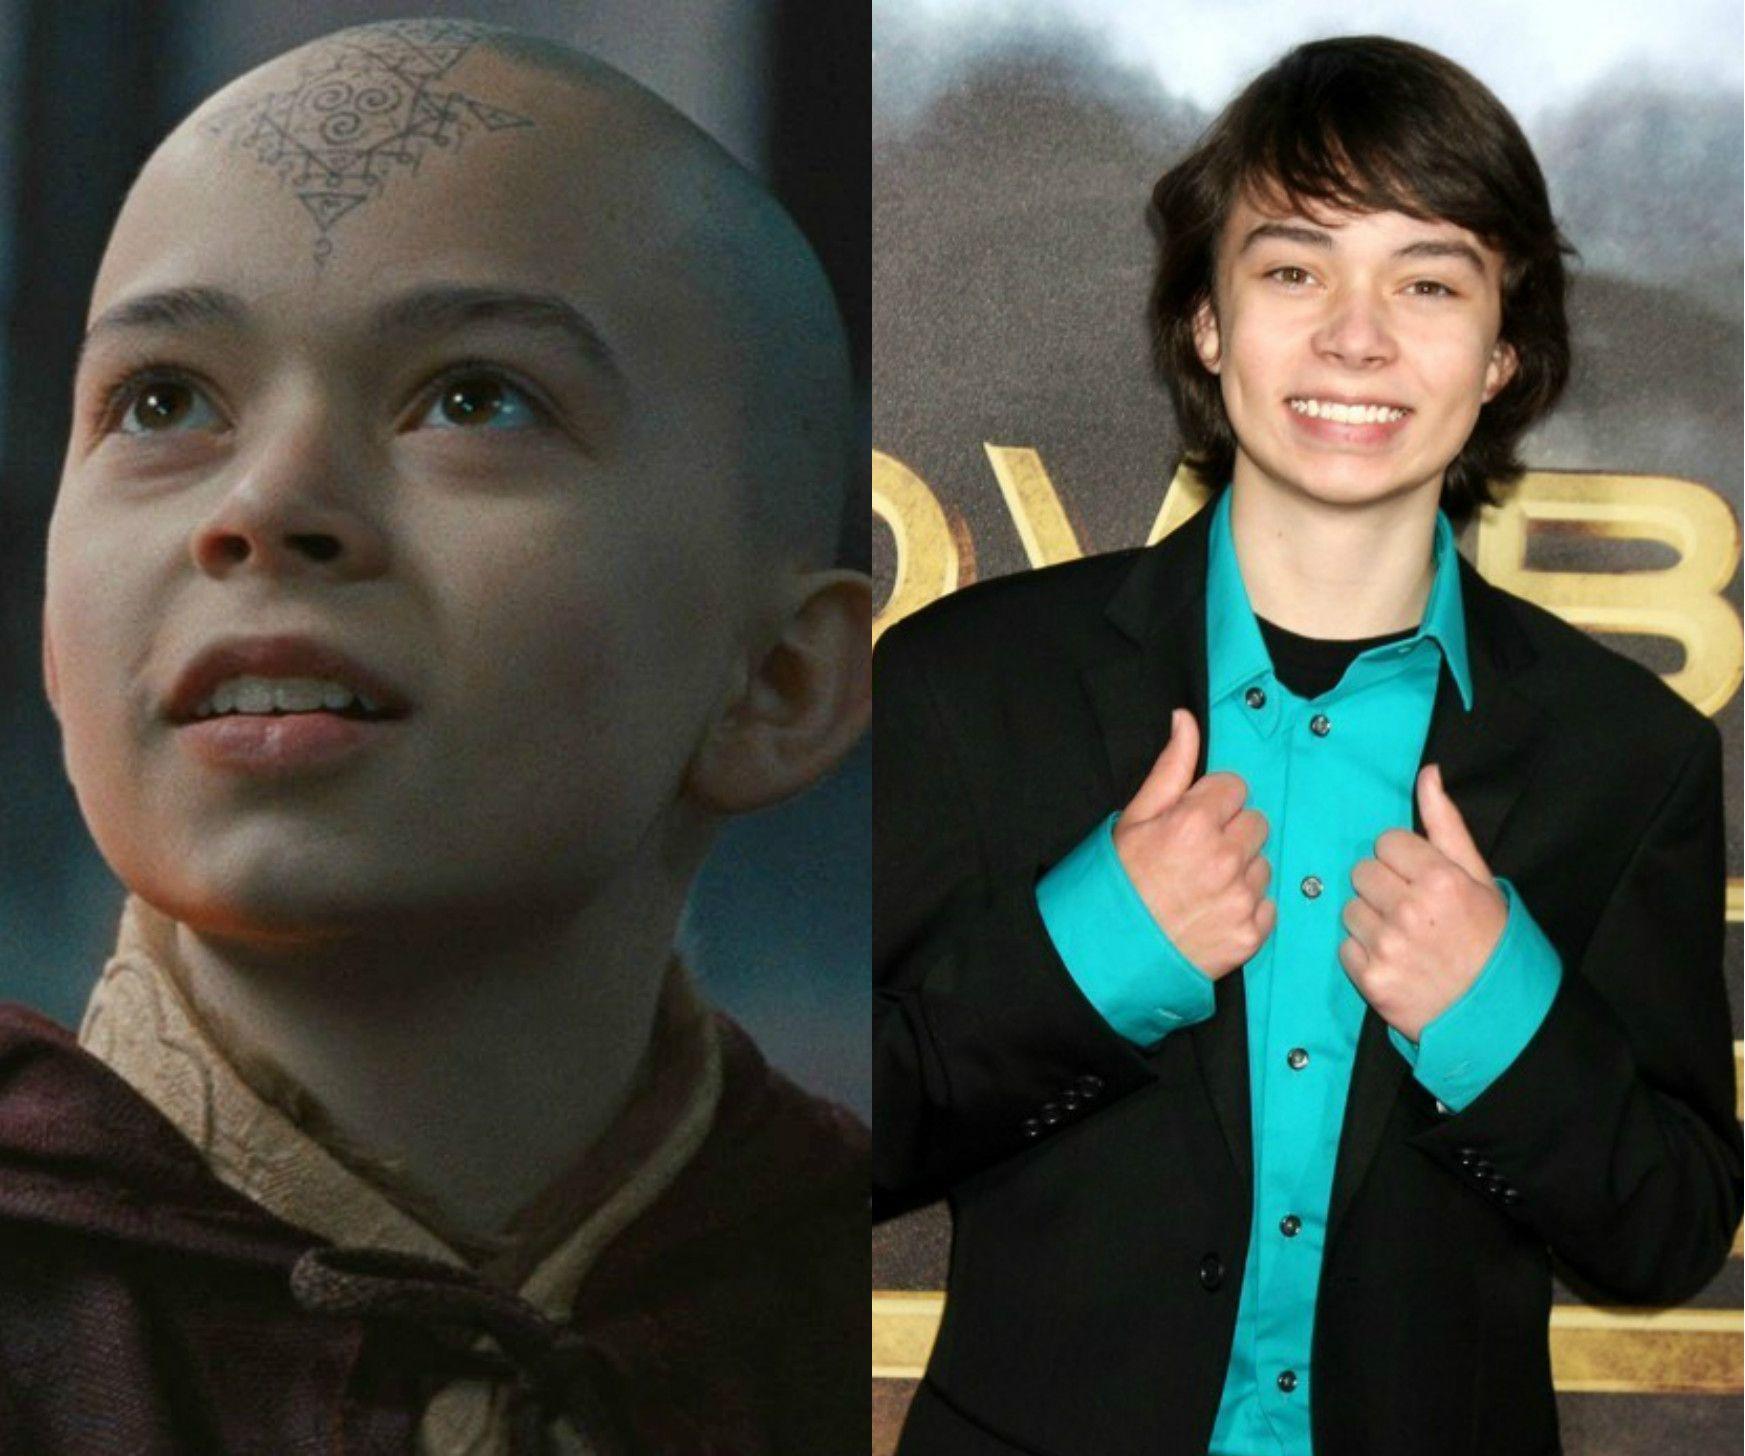 Cast Of Avatar Stars: Noah Ringer [Aang] -- The Last Airbender (2010)